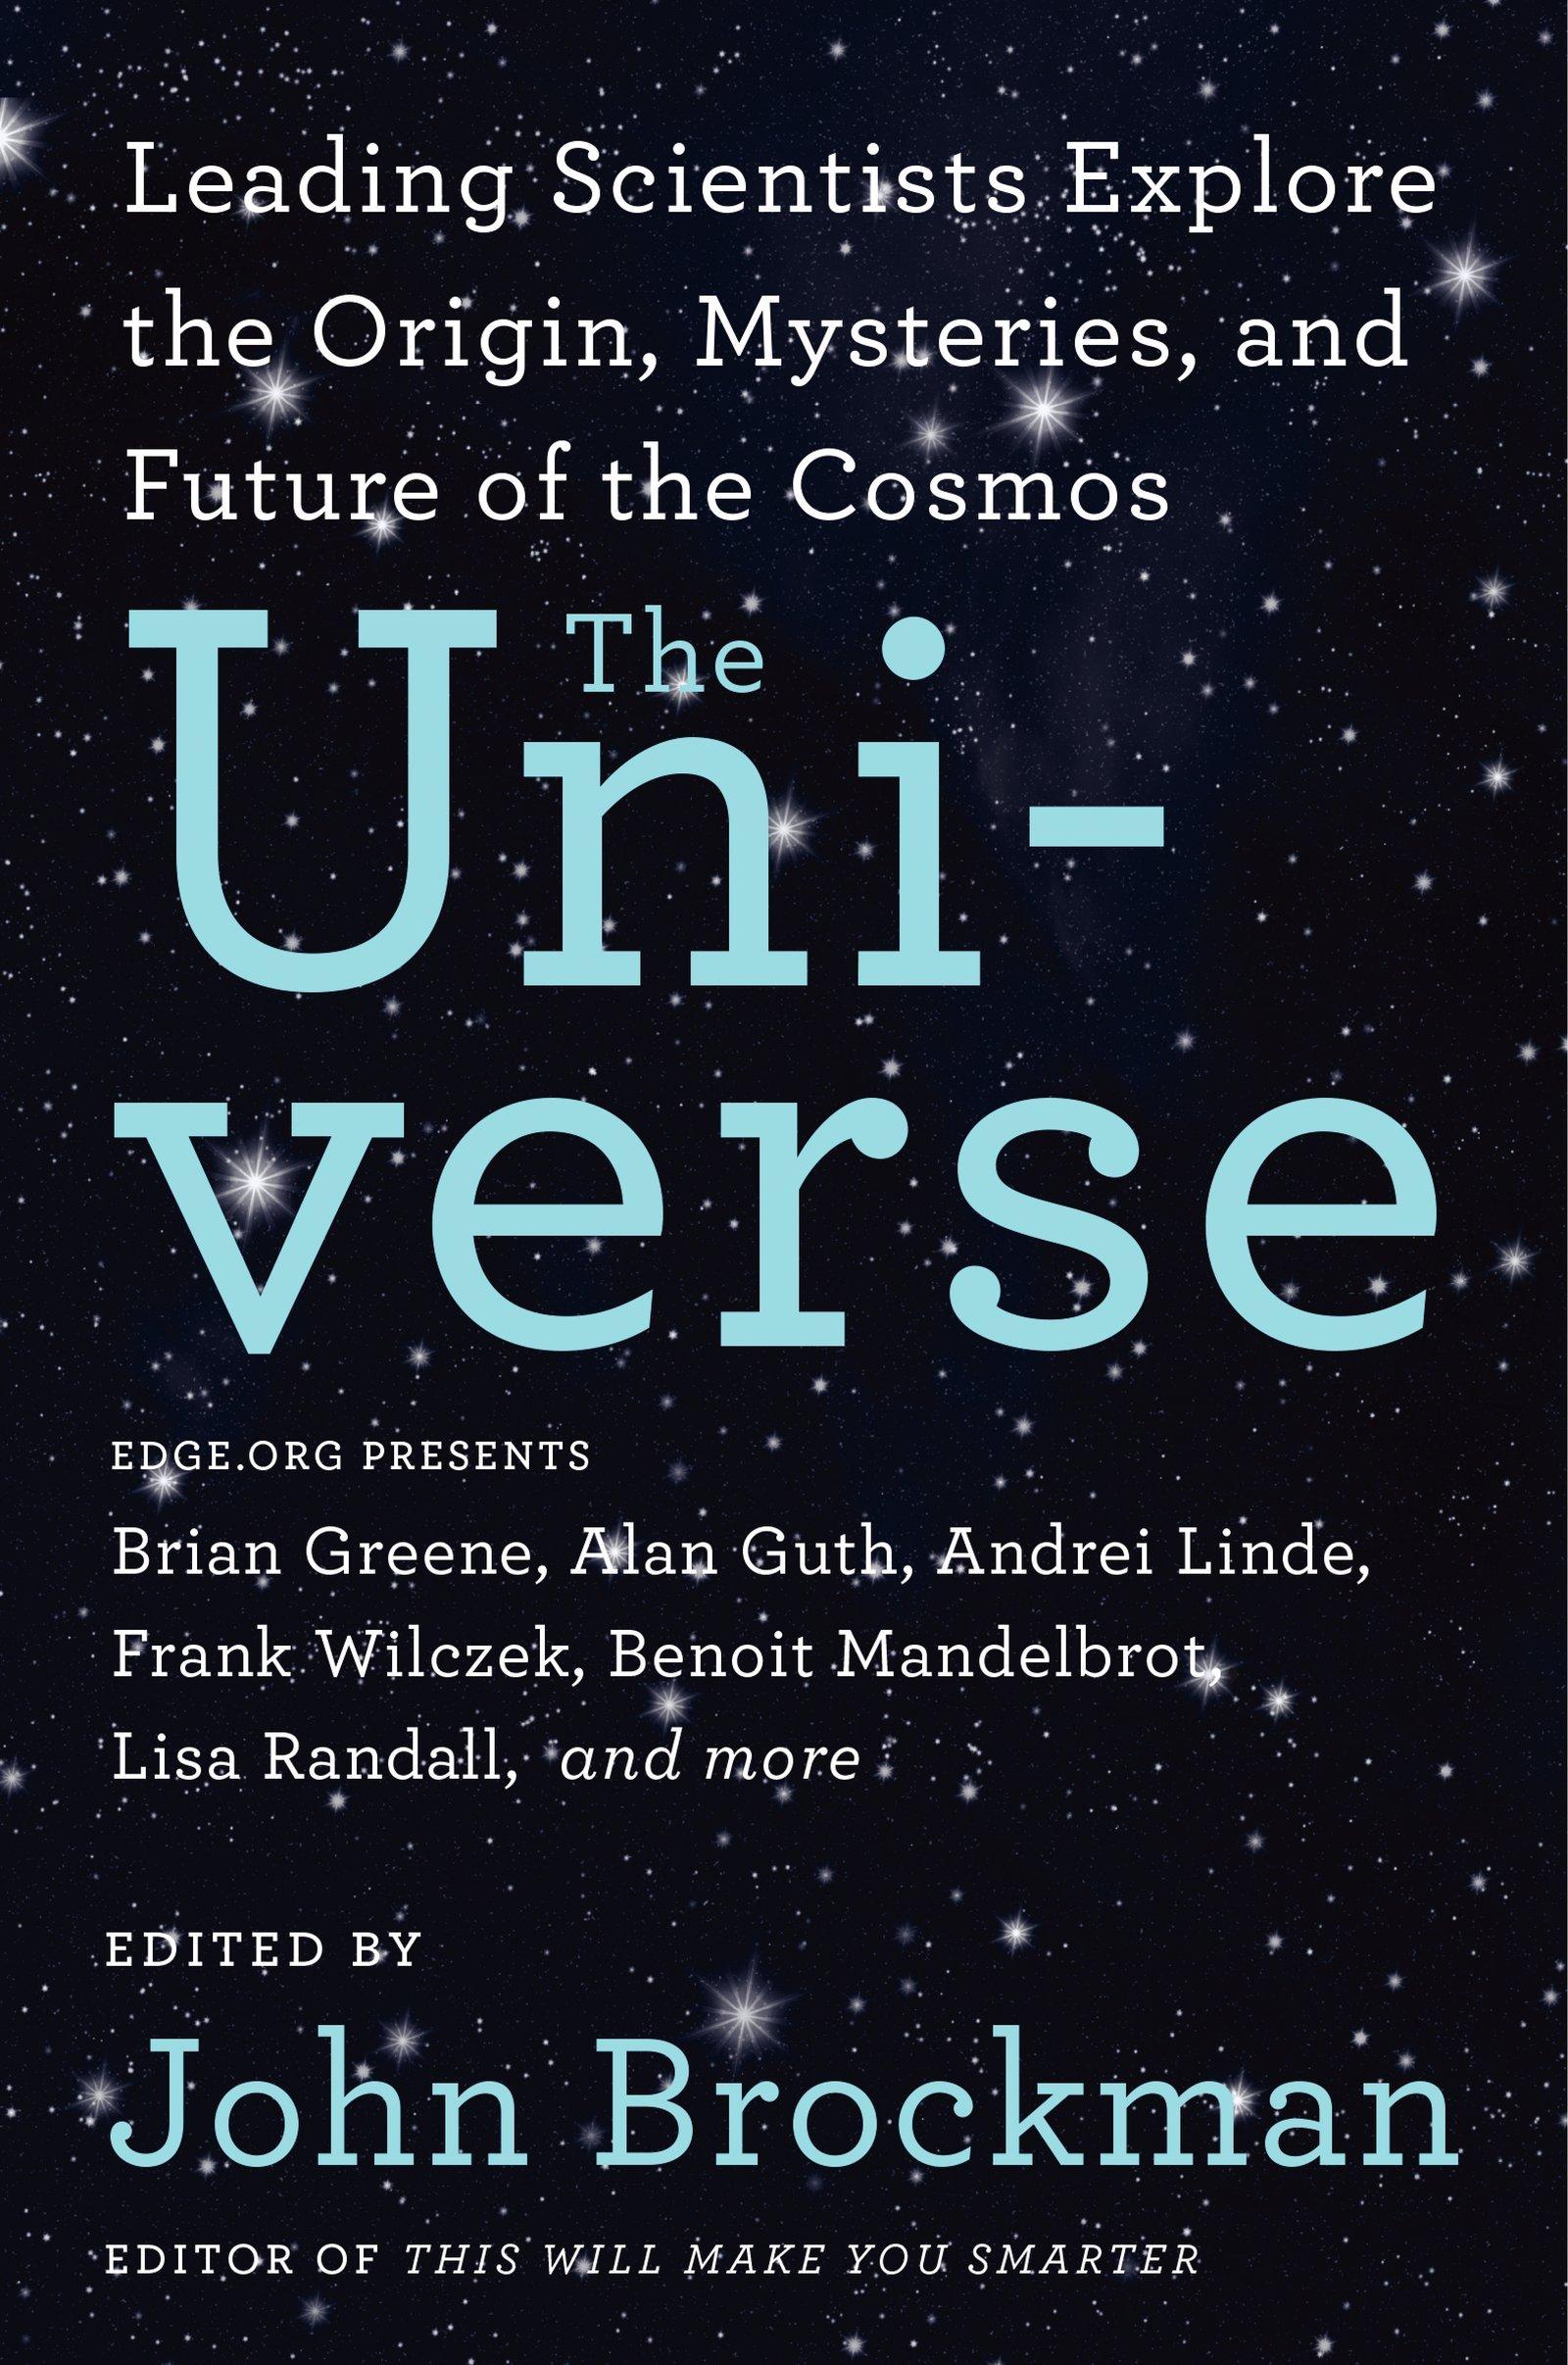 John Brockman (editor) - The Universe